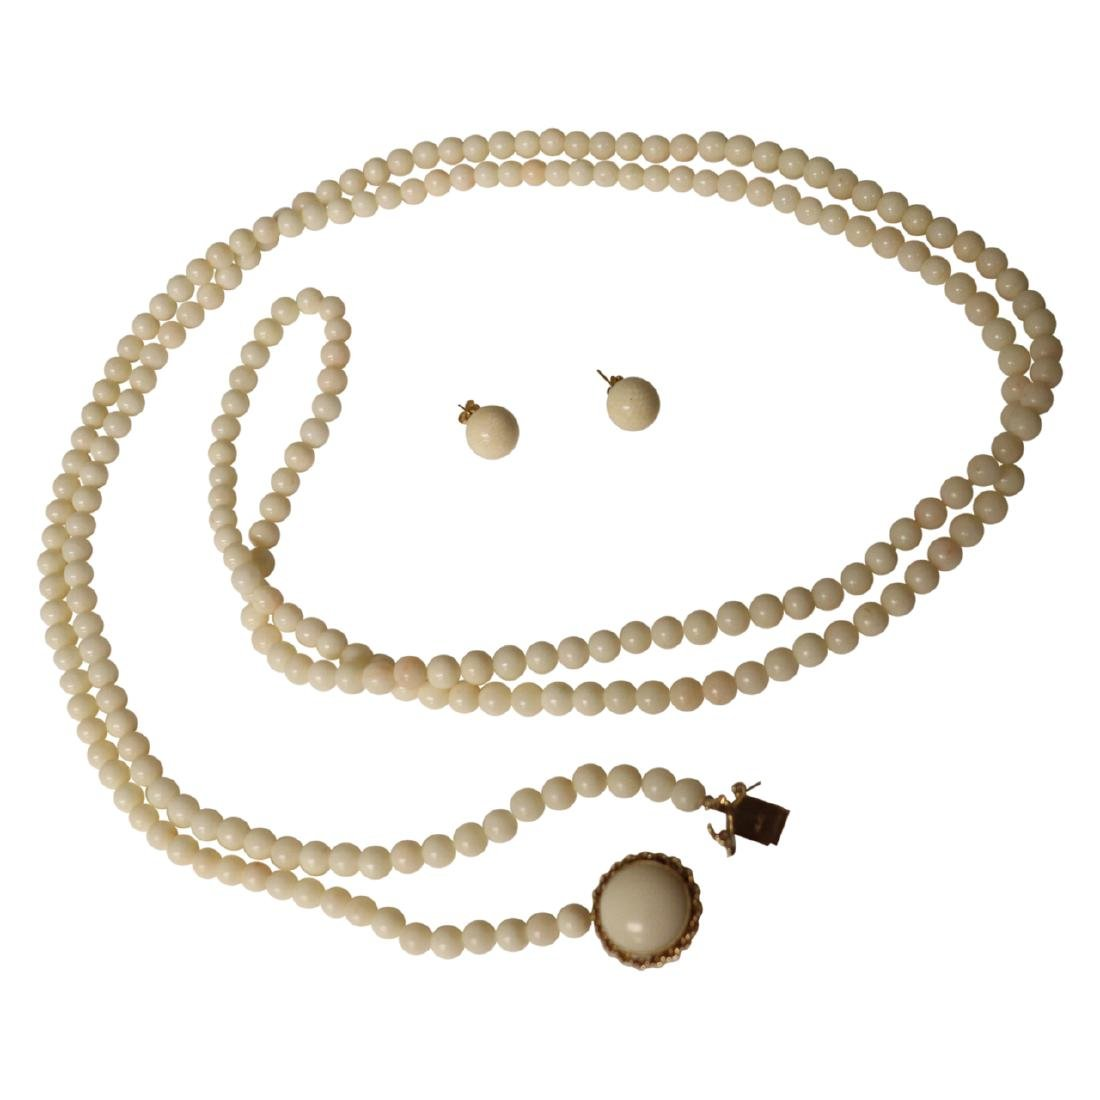 14k Coral Bead Necklace w/ Earrings